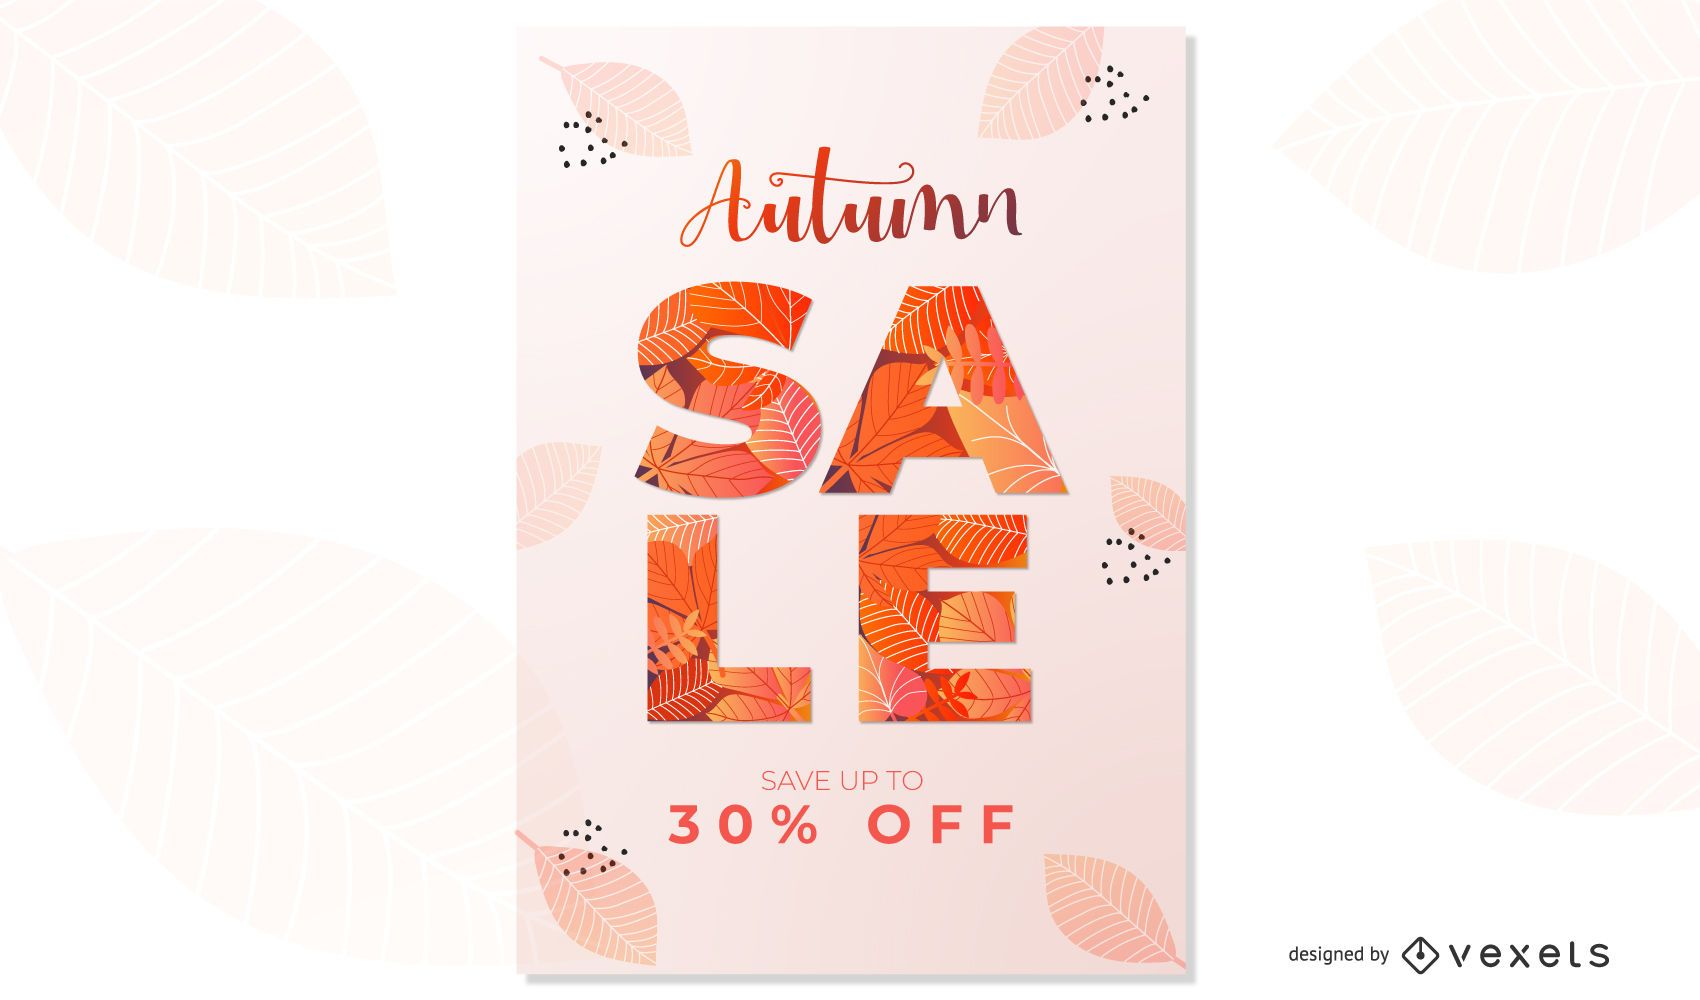 Autumn Sale Poster Design